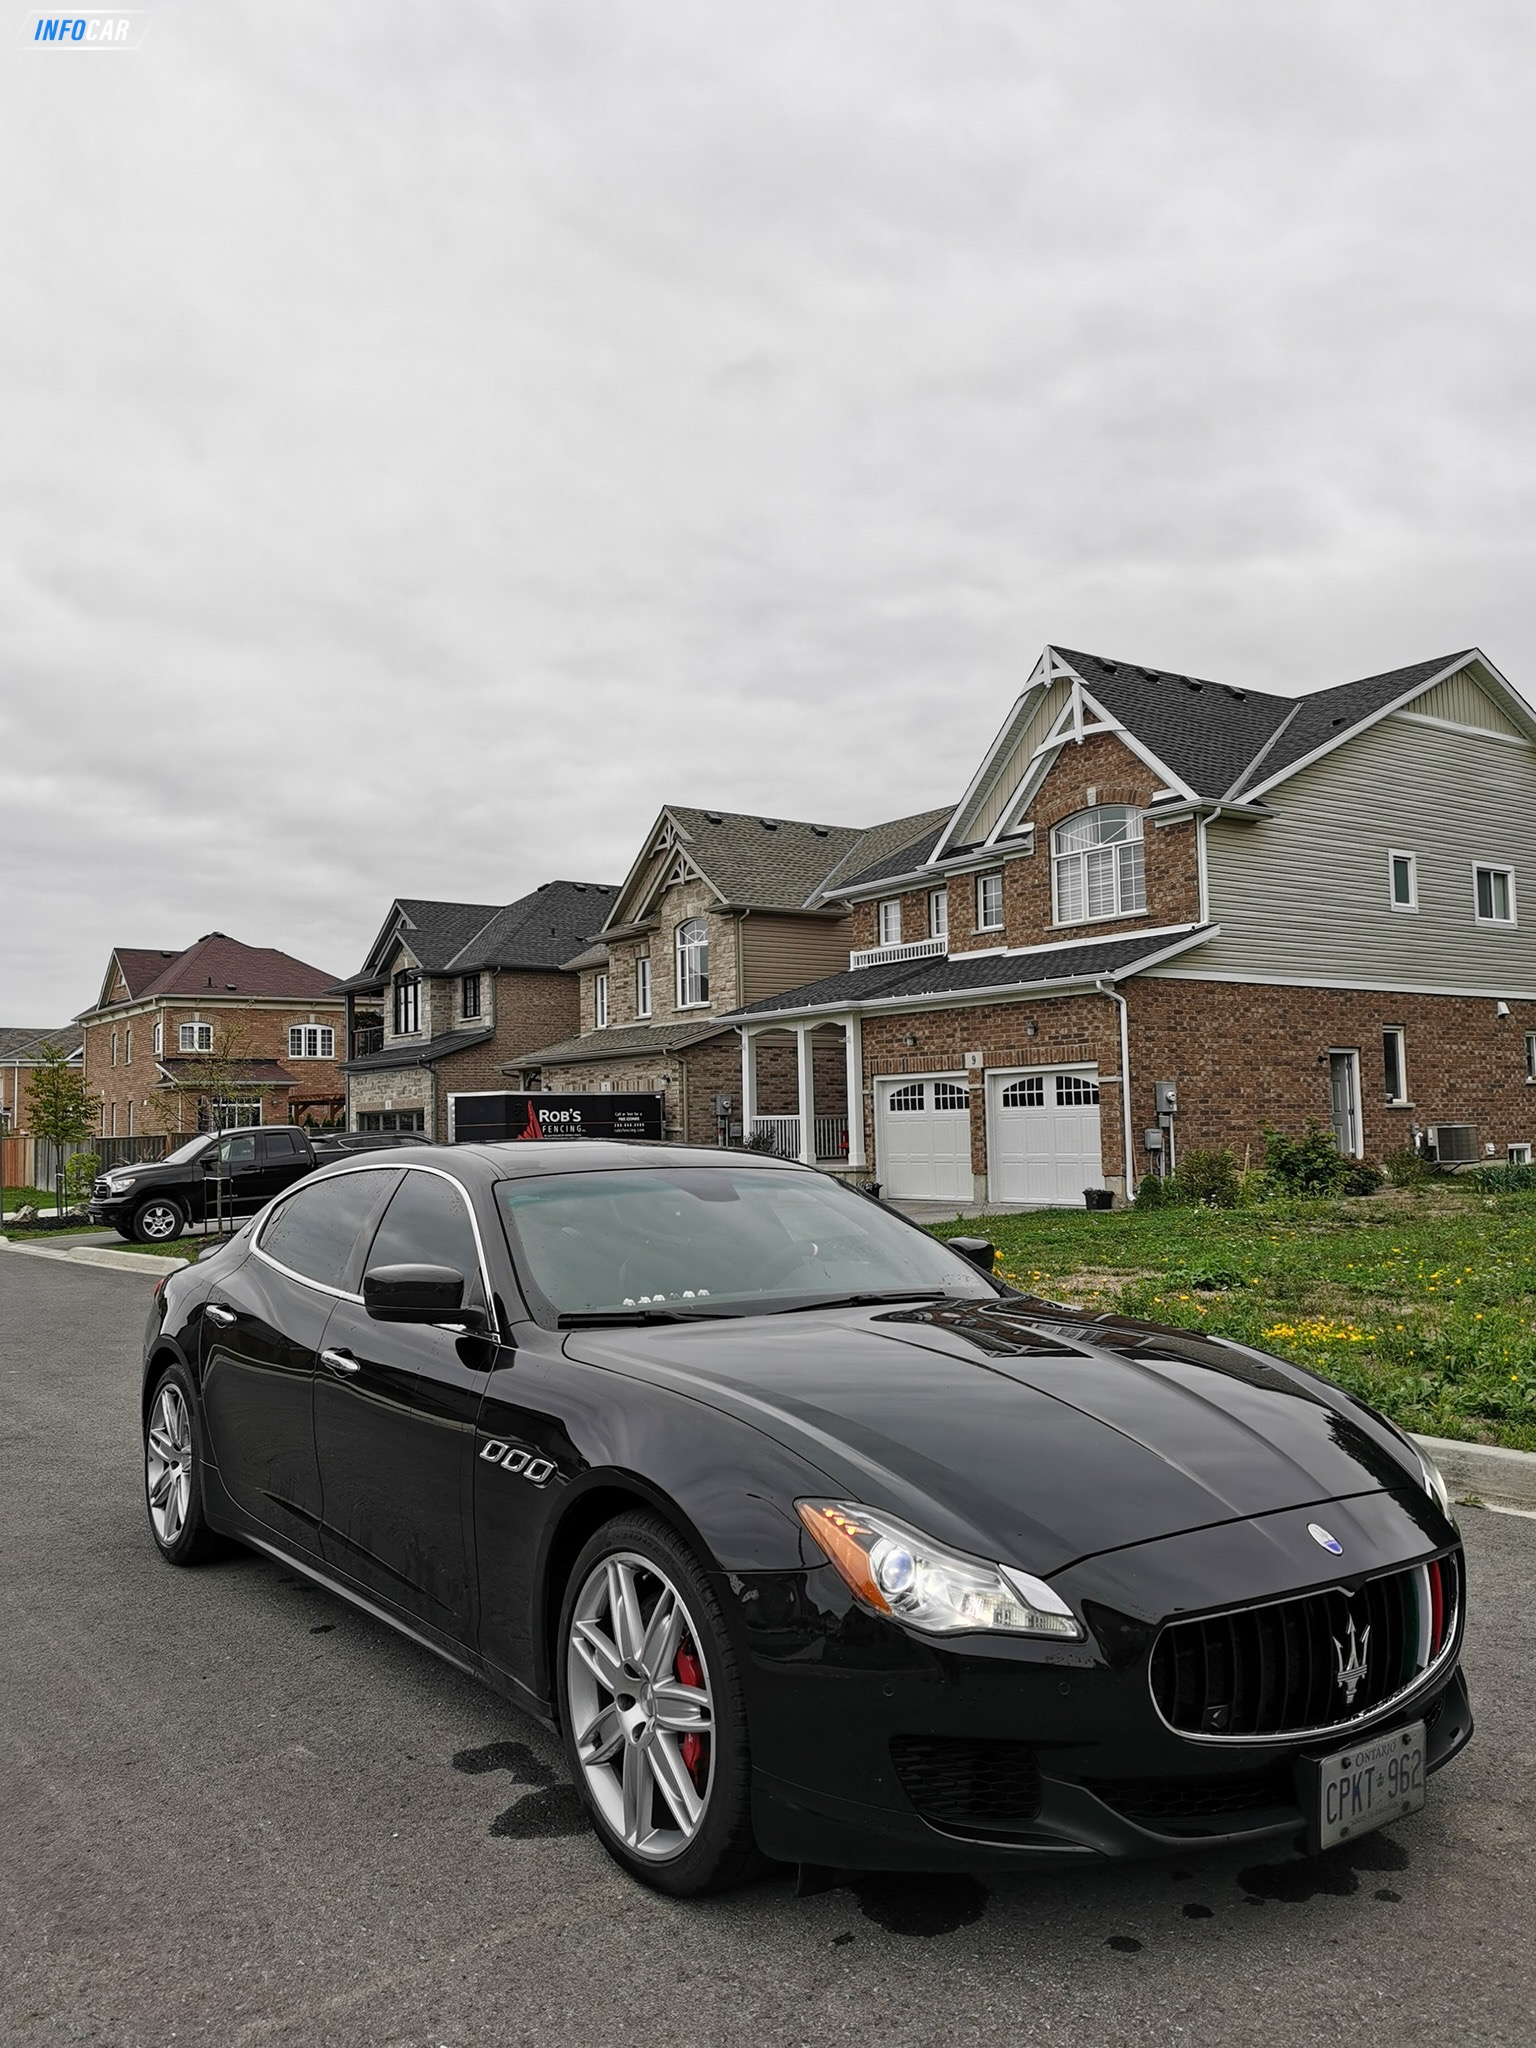 2015 Maserati Quattroporte Gts - INFOCAR - Toronto's Most Comprehensive New and Used Auto Trading Platform